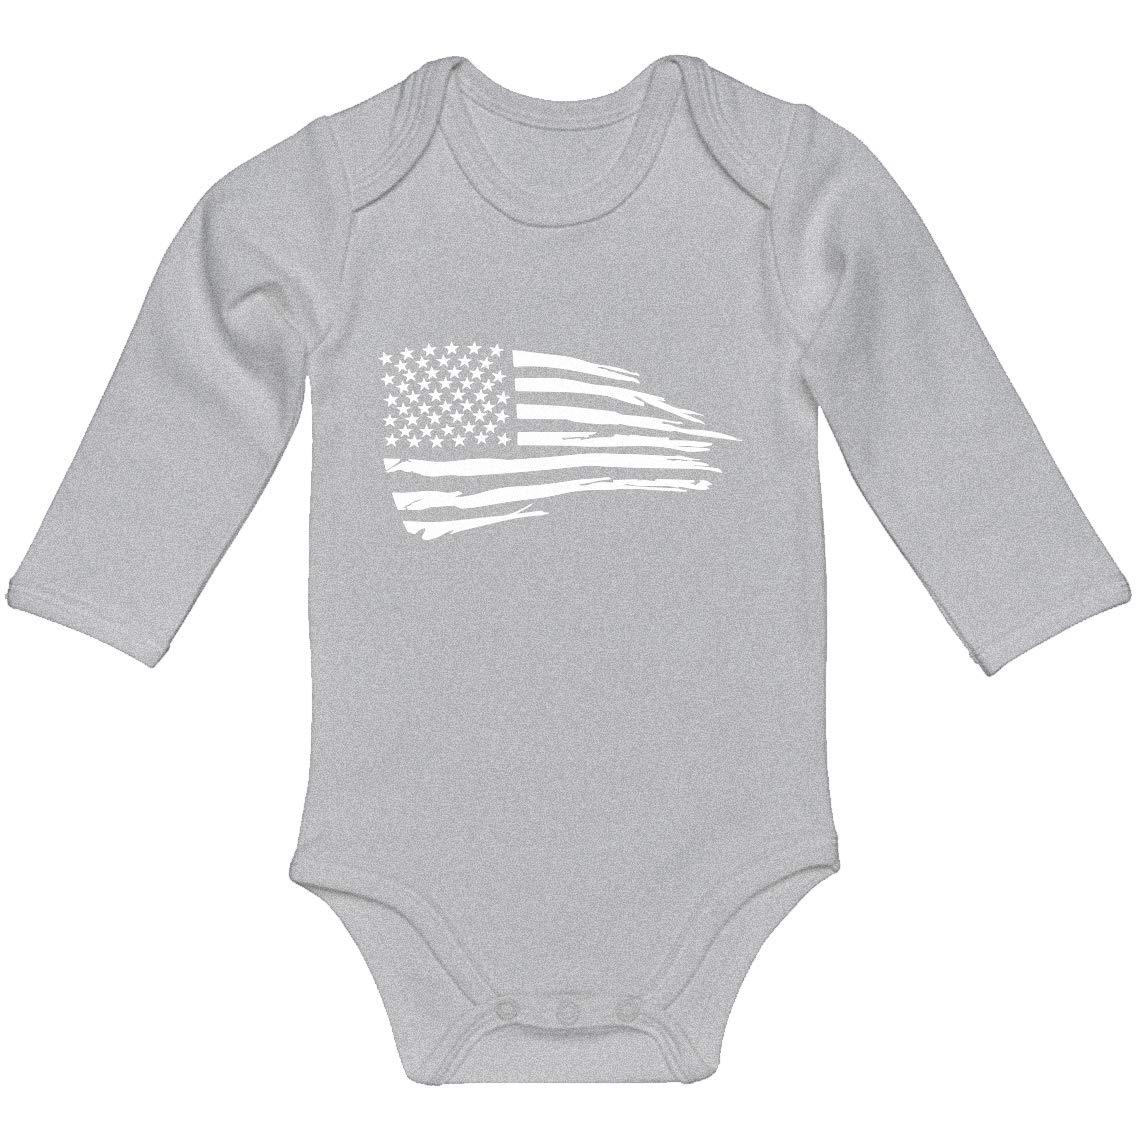 Baby Romper American Flag 100/% Cotton Long Sleeve Infant Bodysuit